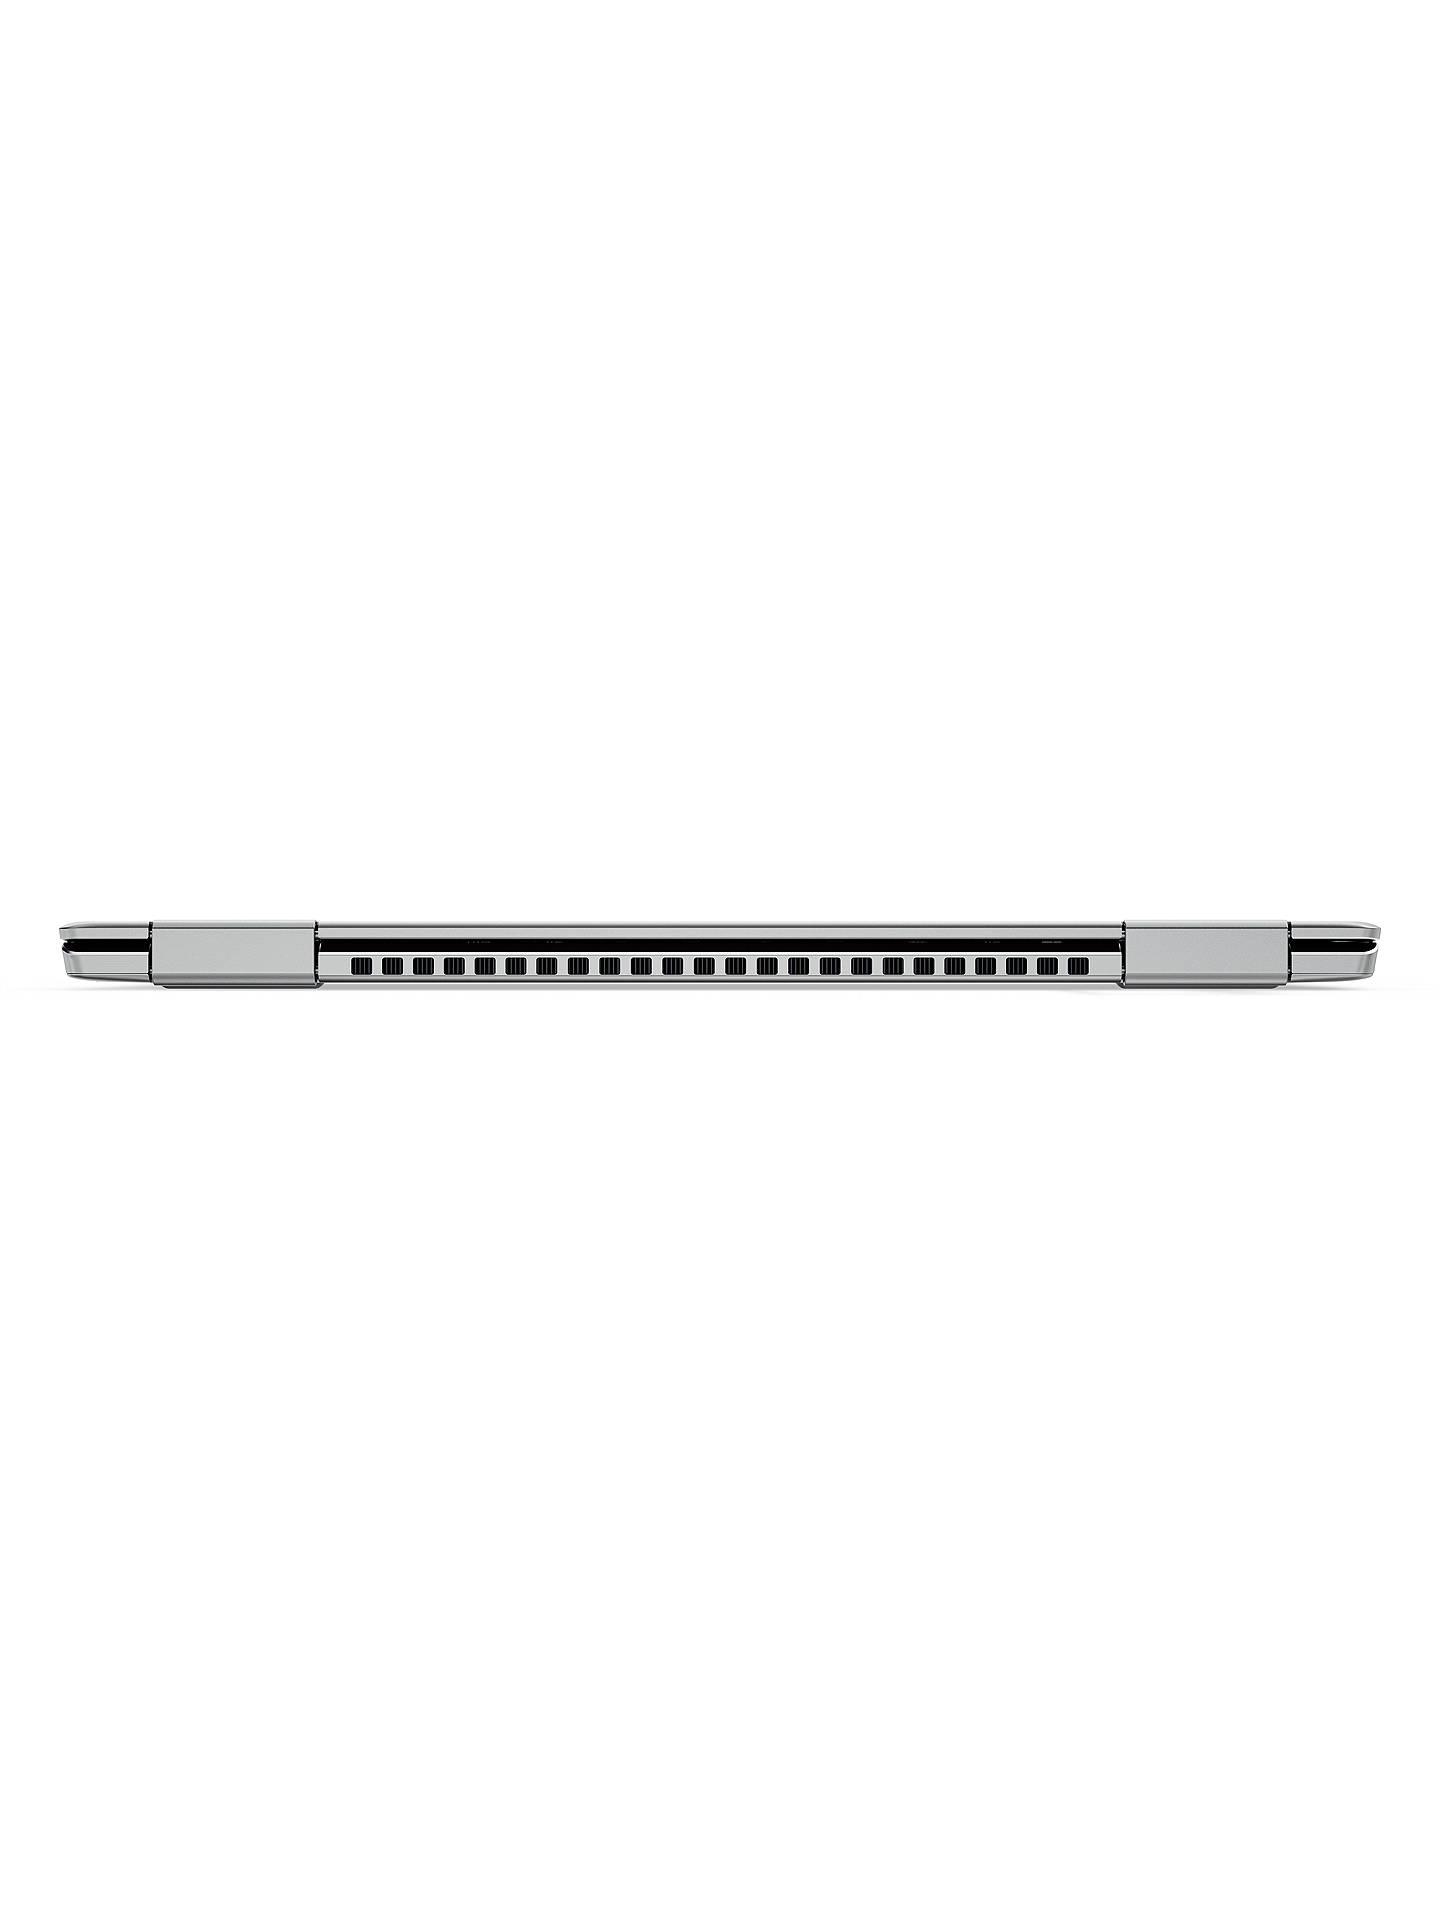 Lenovo Yoga 720 Convertible Laptop With Active Pen Intel Core I7 8gb Ram 256gb Ssd Nvidia Geforce Gtx 1050 15 6 Full Hd Platinum At John Lewis Partners